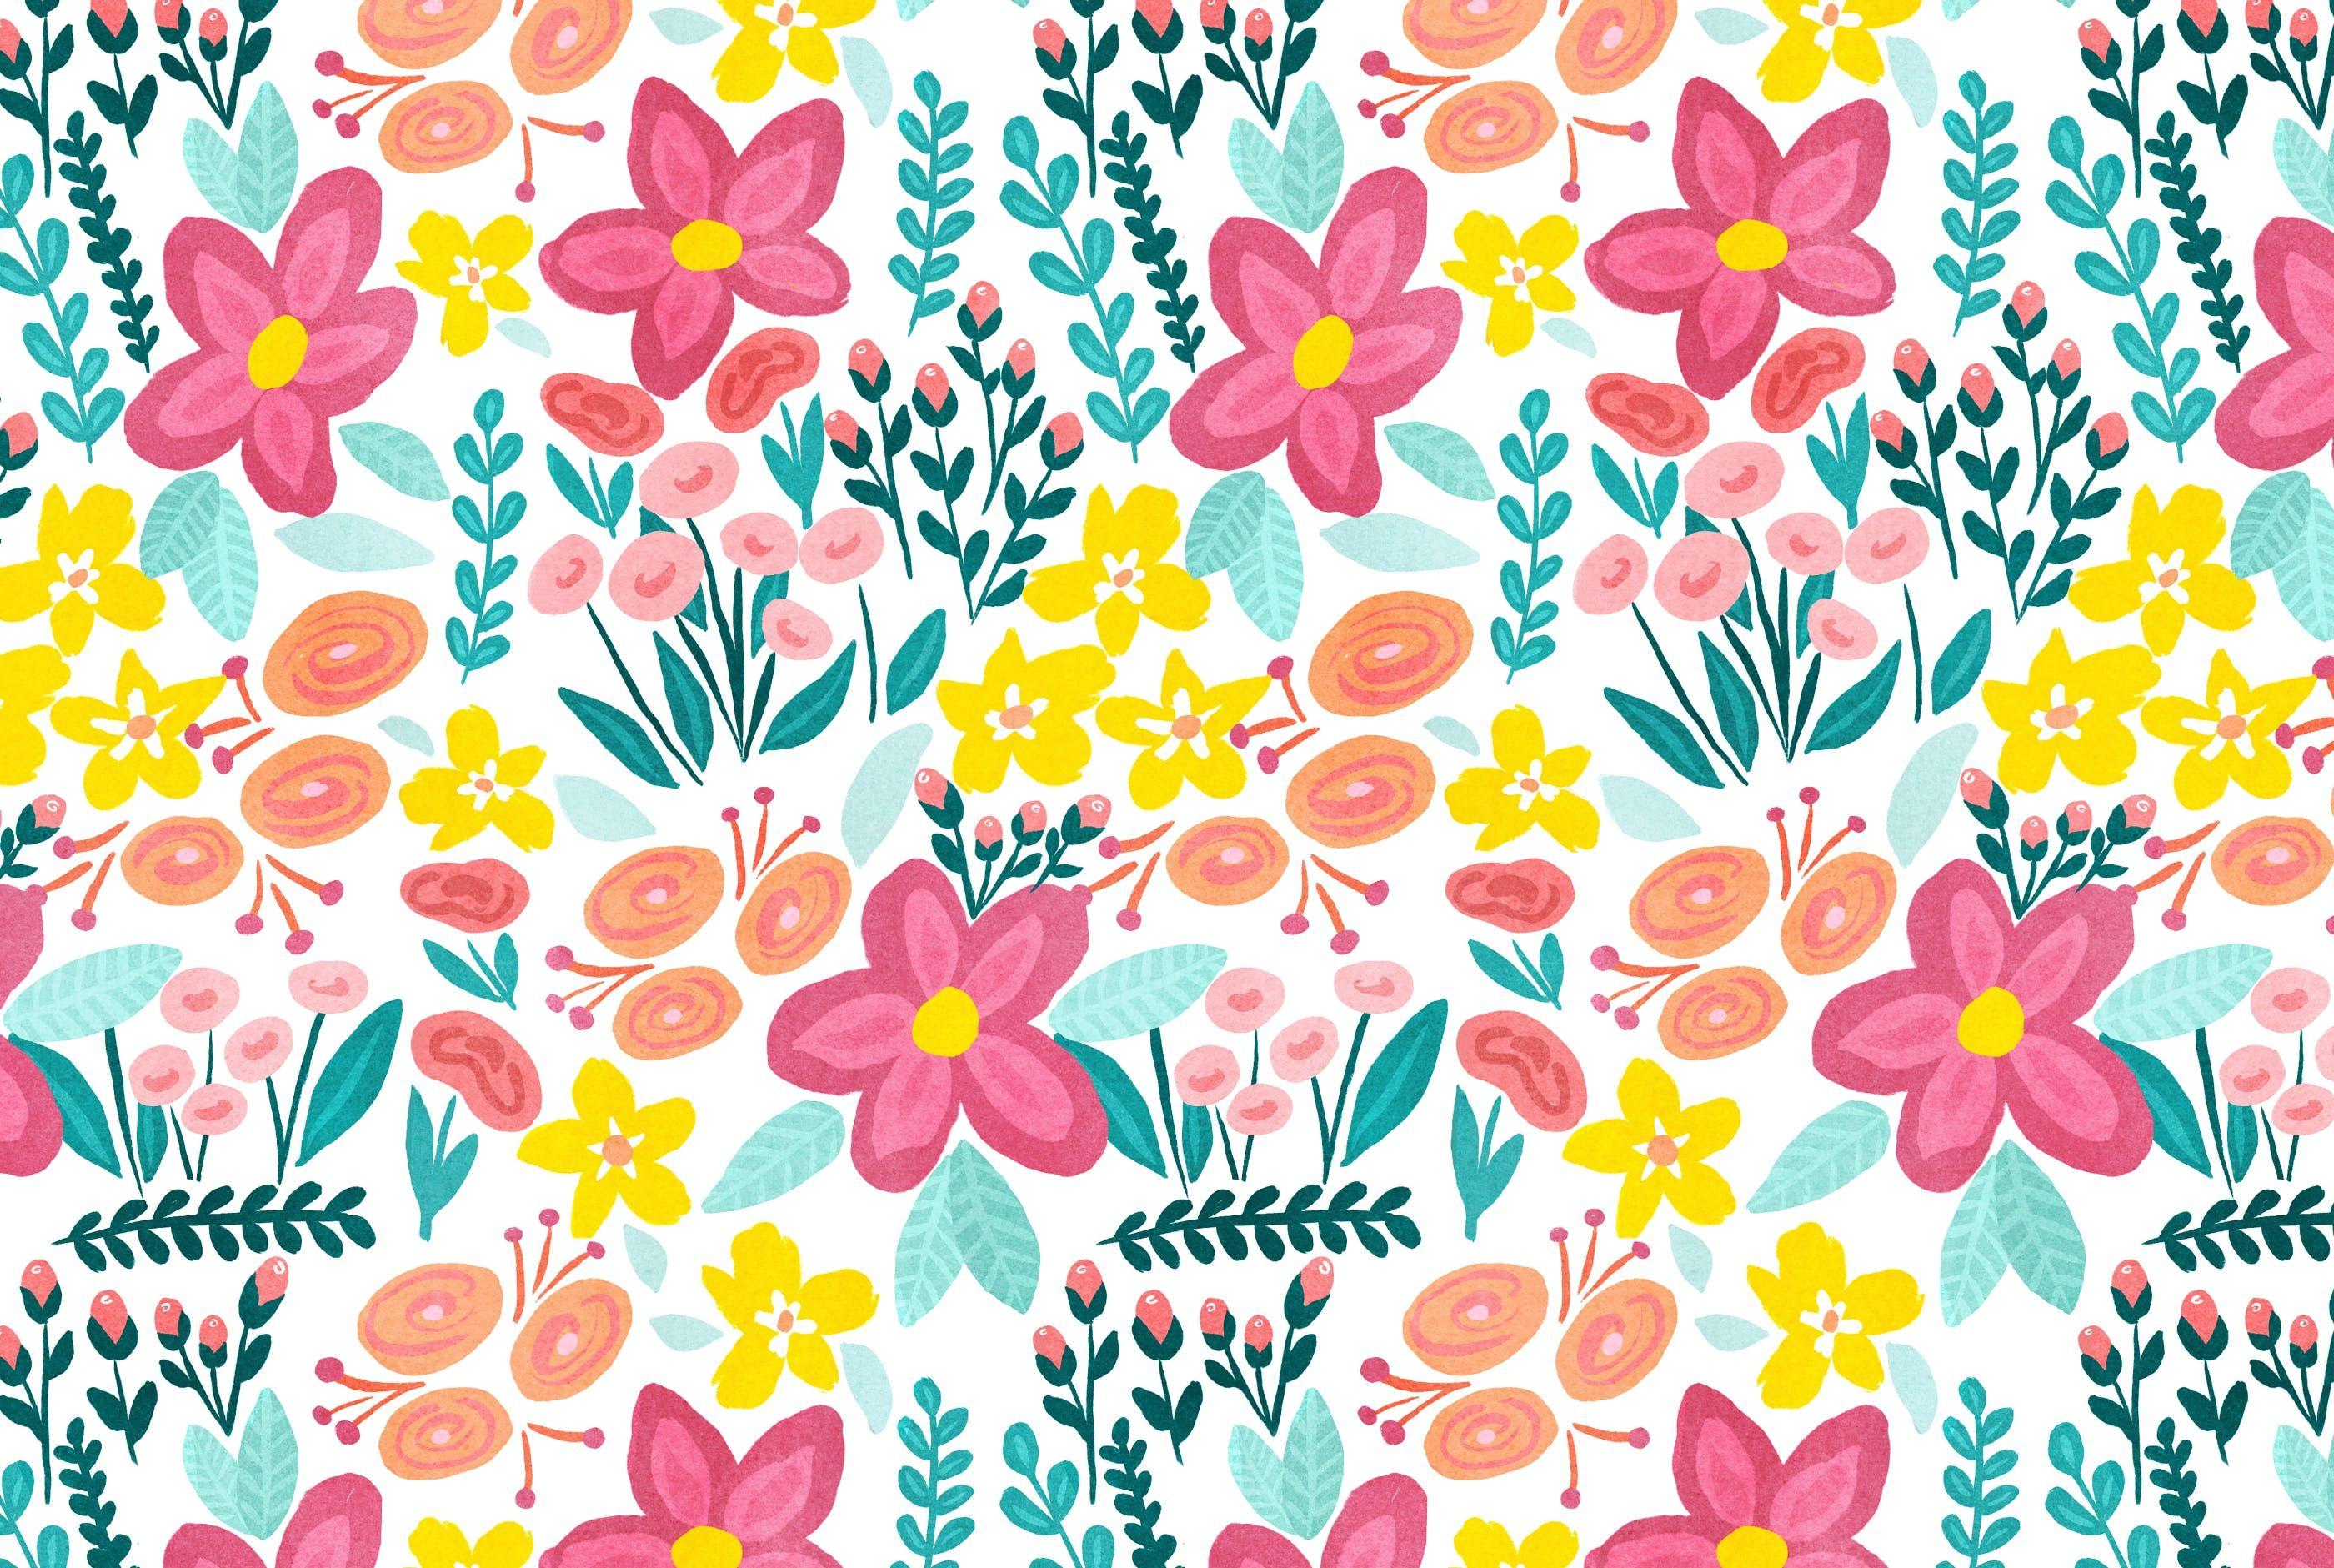 4 Free Summer Desktop Wallpapers May Designs Digital Wallpaper Wallpaper Cellphone Wallpaper